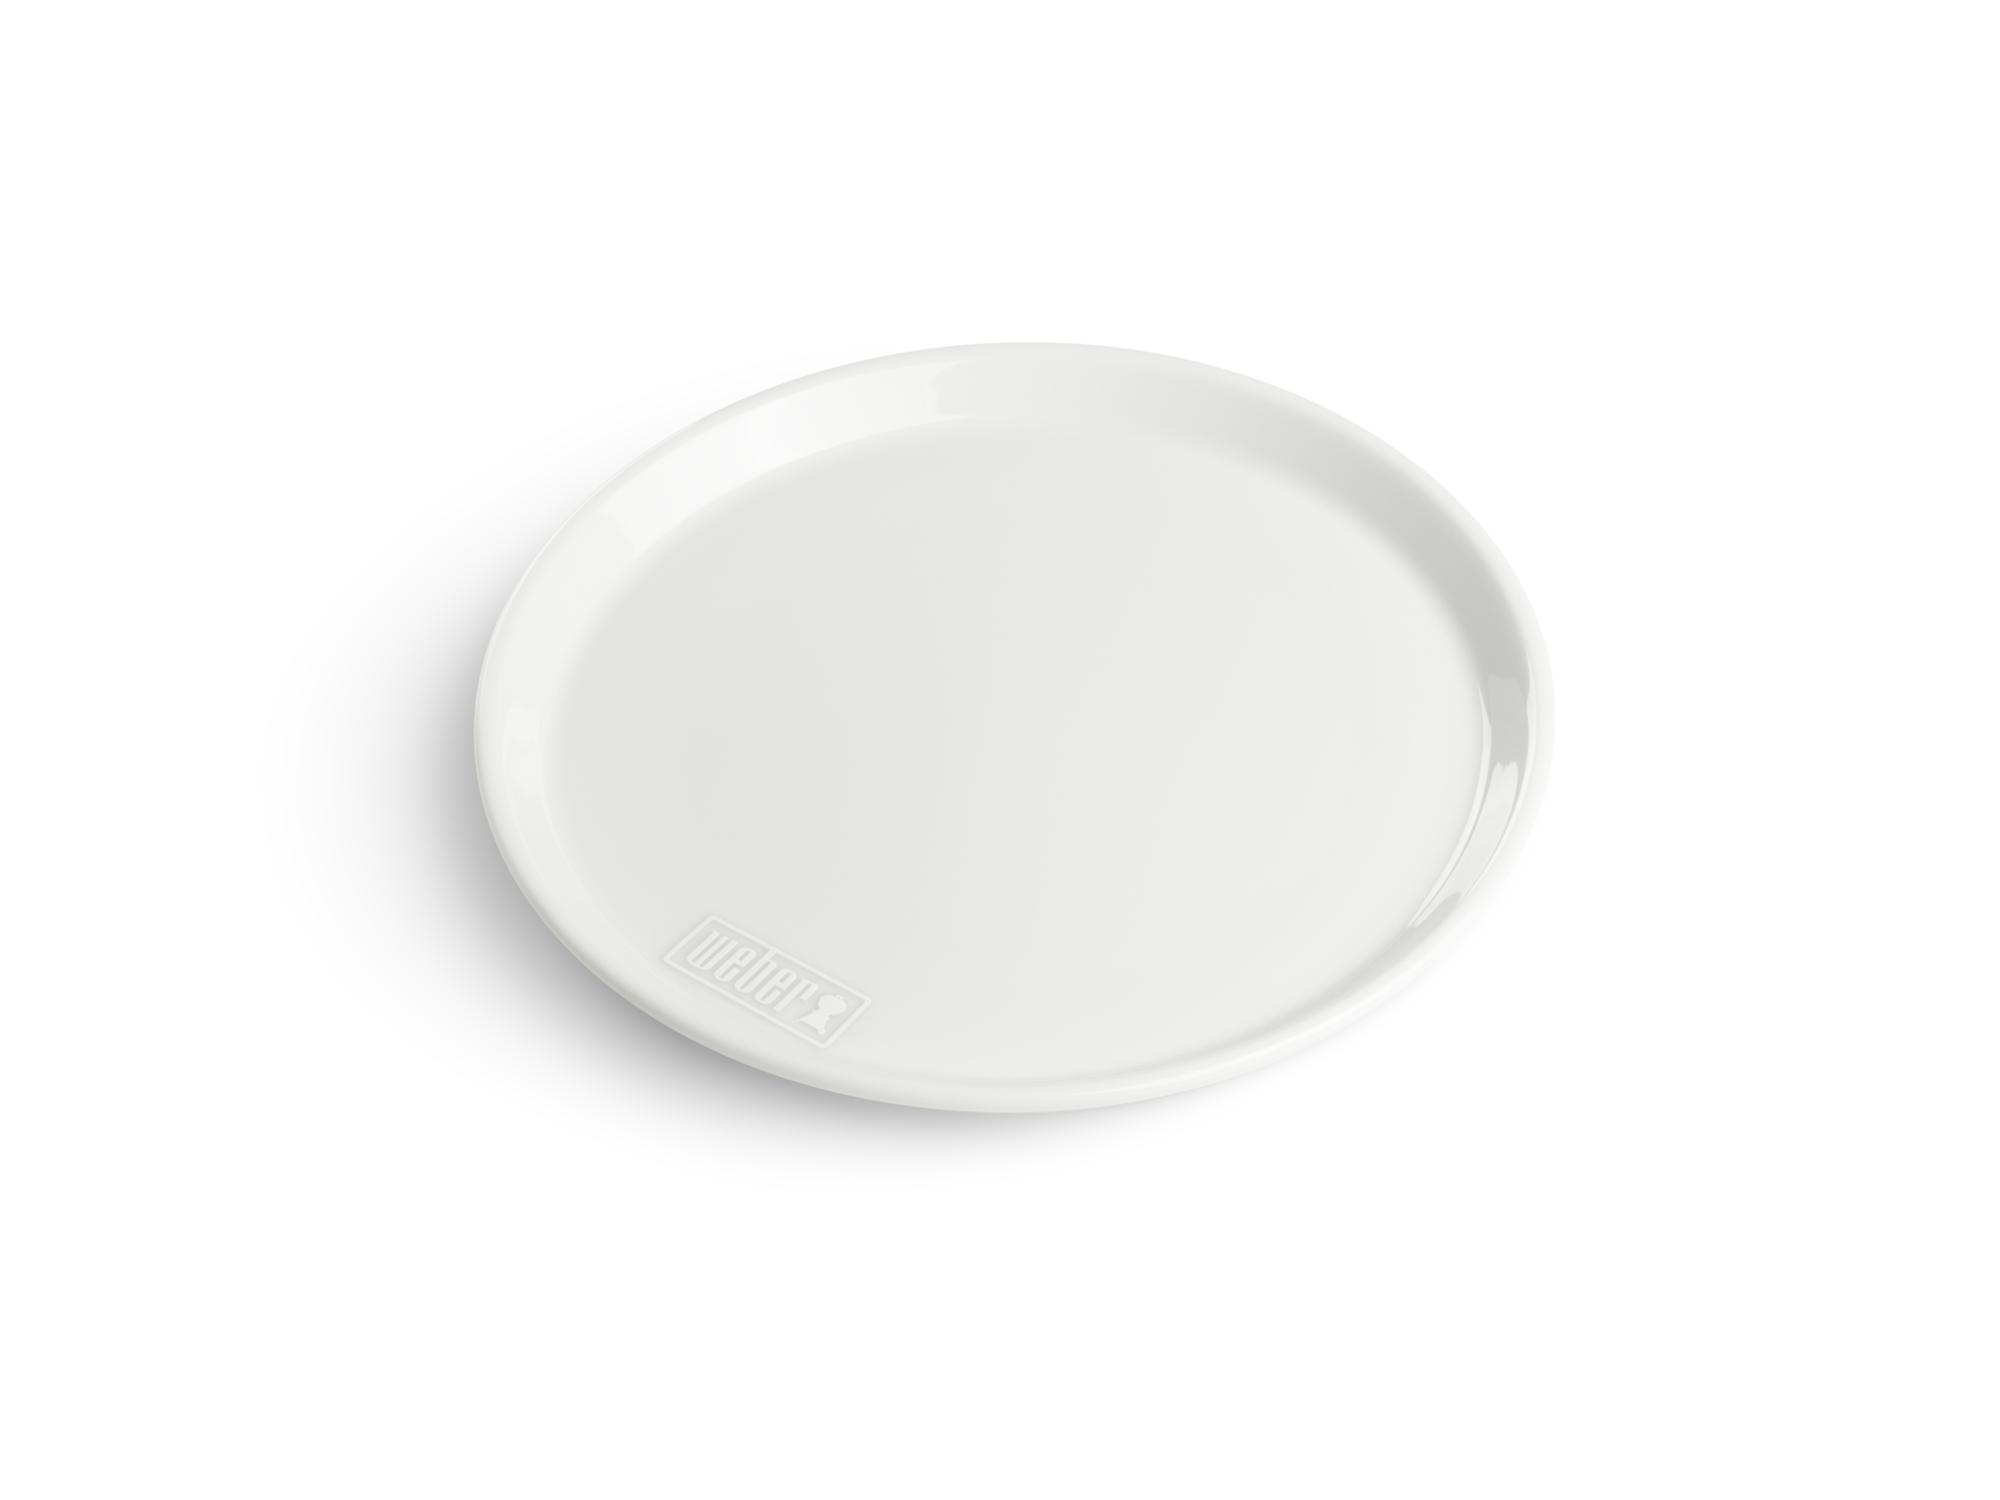 Weber Dessert-Teller, klein